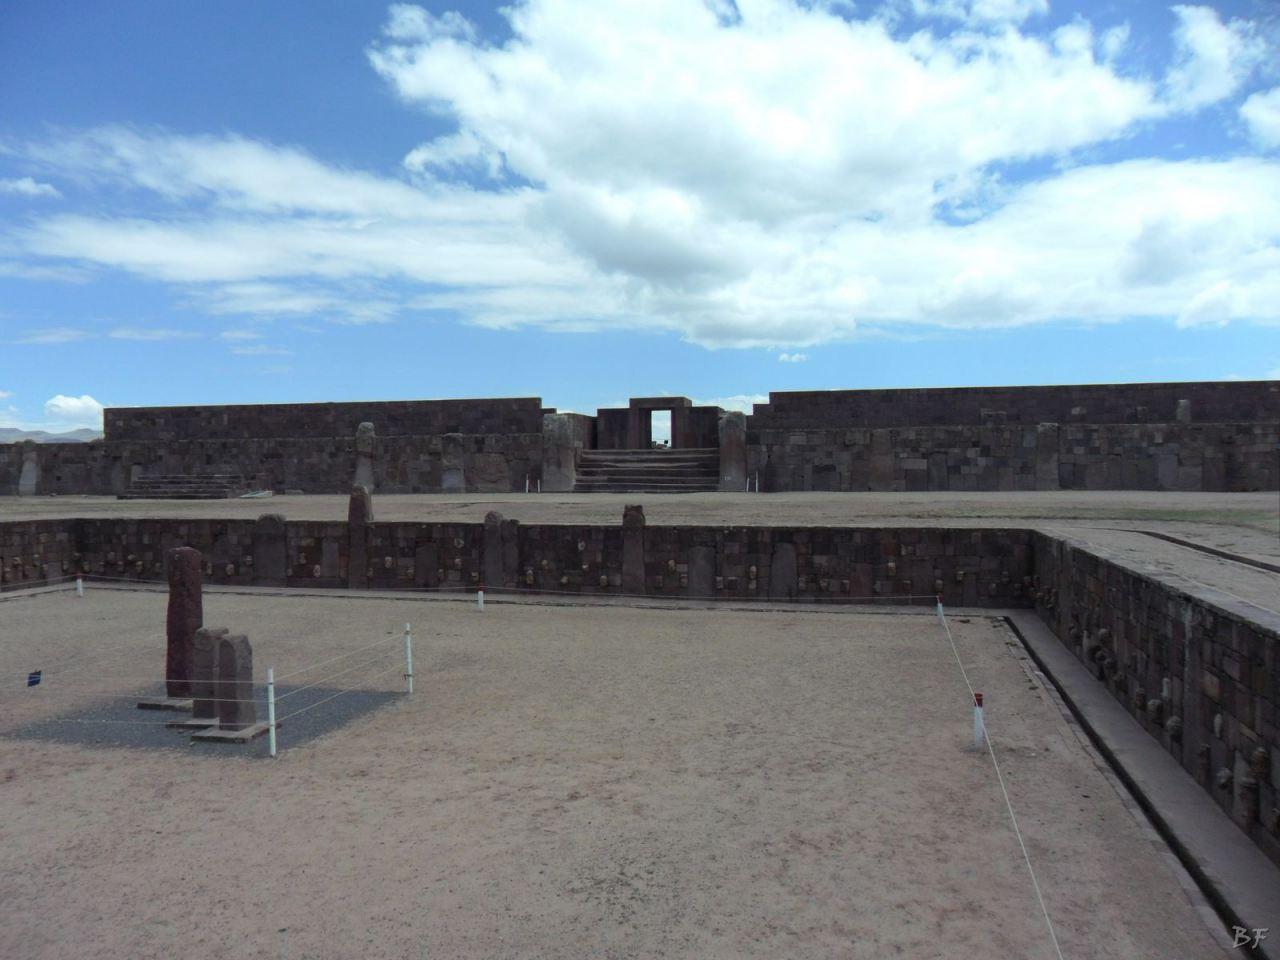 Sito-Megalitico-Piramide-Akapana-Kalasasaya-Menhir-Tiahuanaco-Bolivia-73